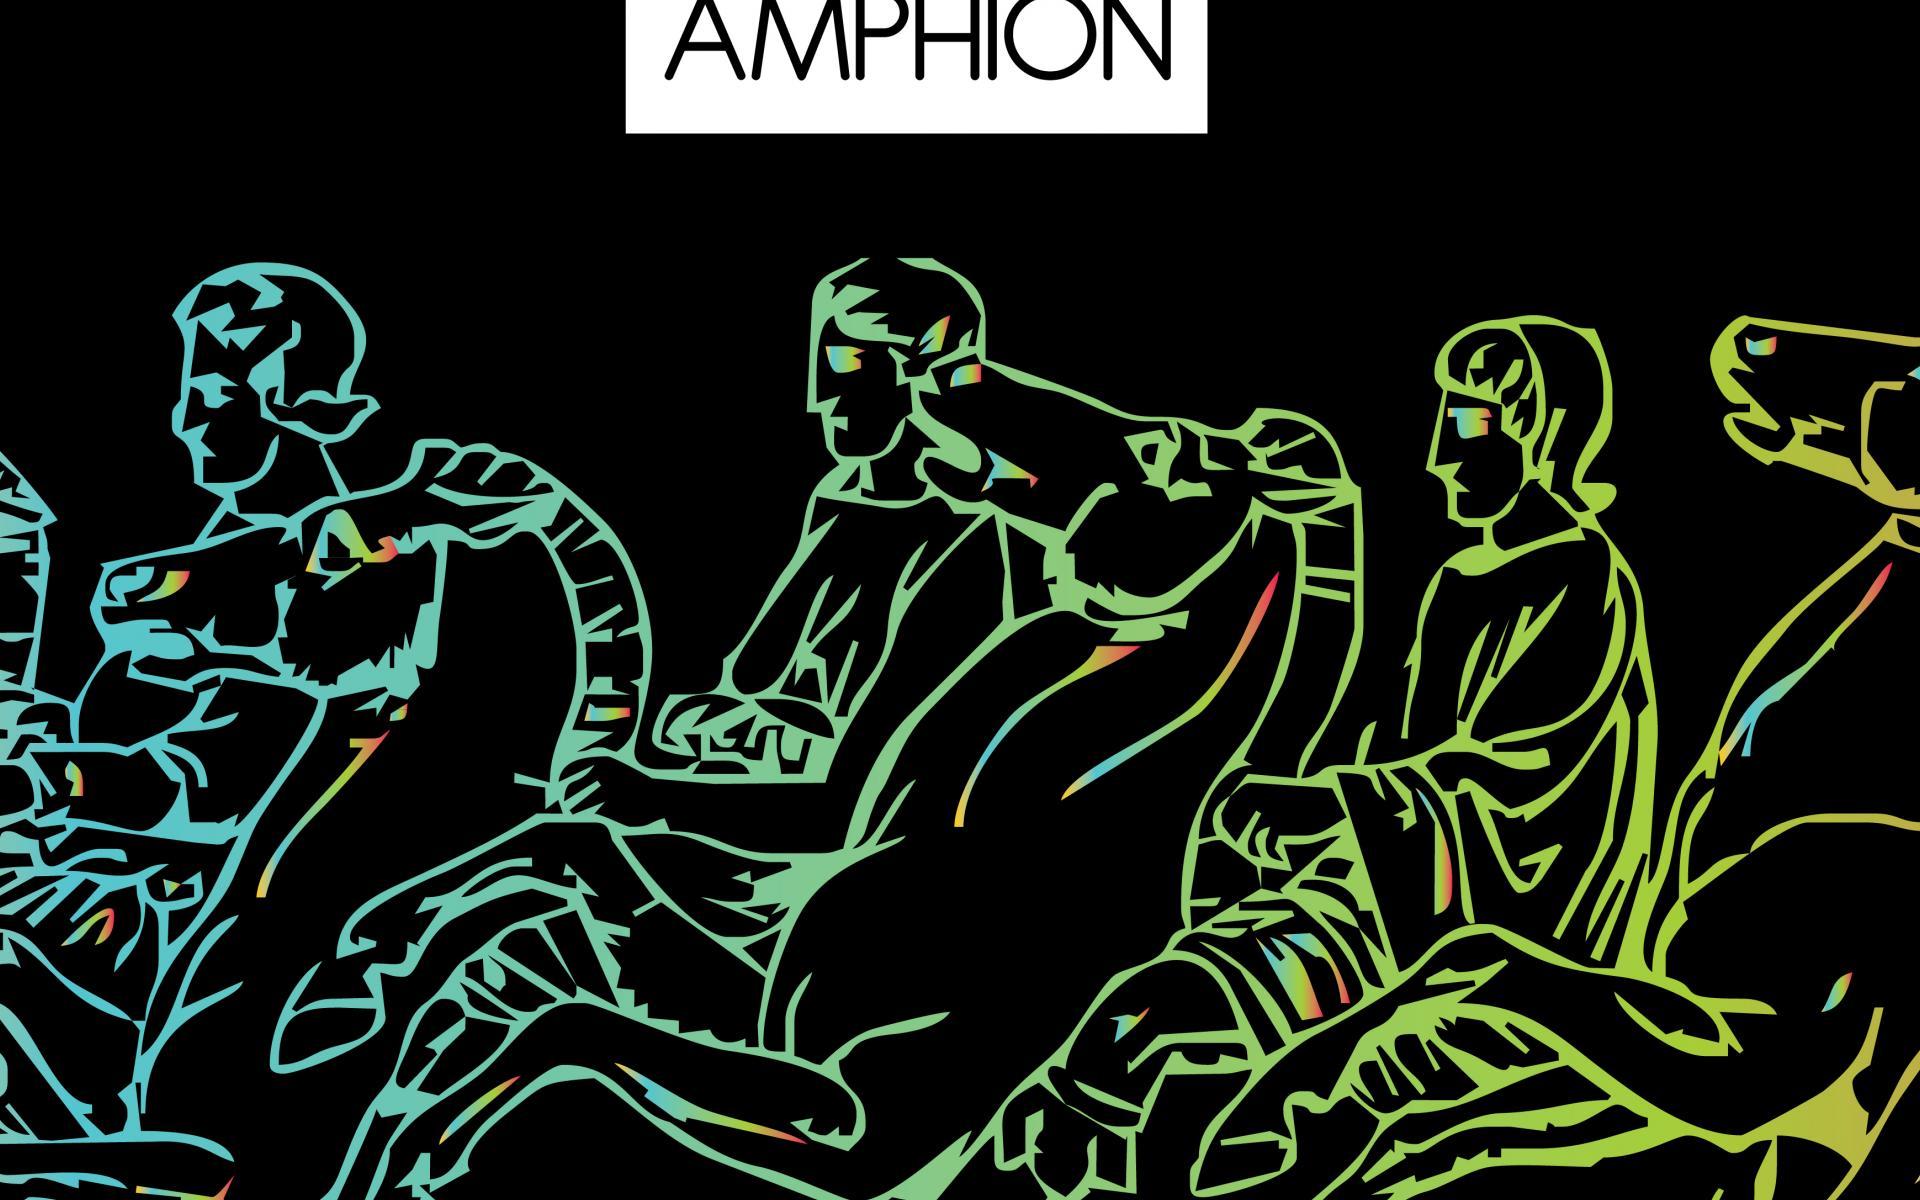 Amphion Team Interview